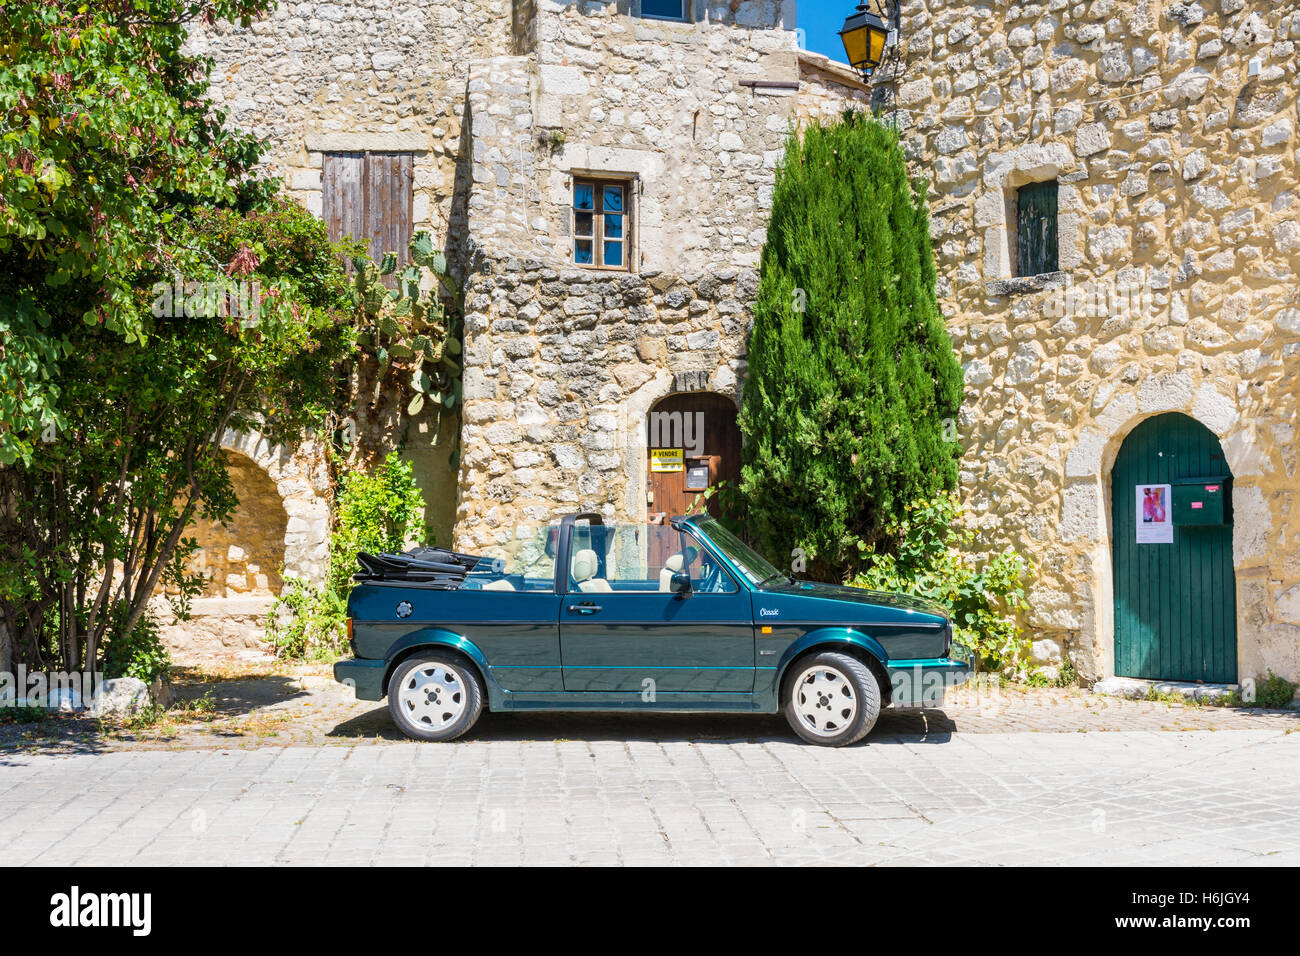 Volkswagen Golf Cabriolet GLI 1.8 Karmann parked in the pretty village of La Garde-Adhémar in Southern France - Stock Image